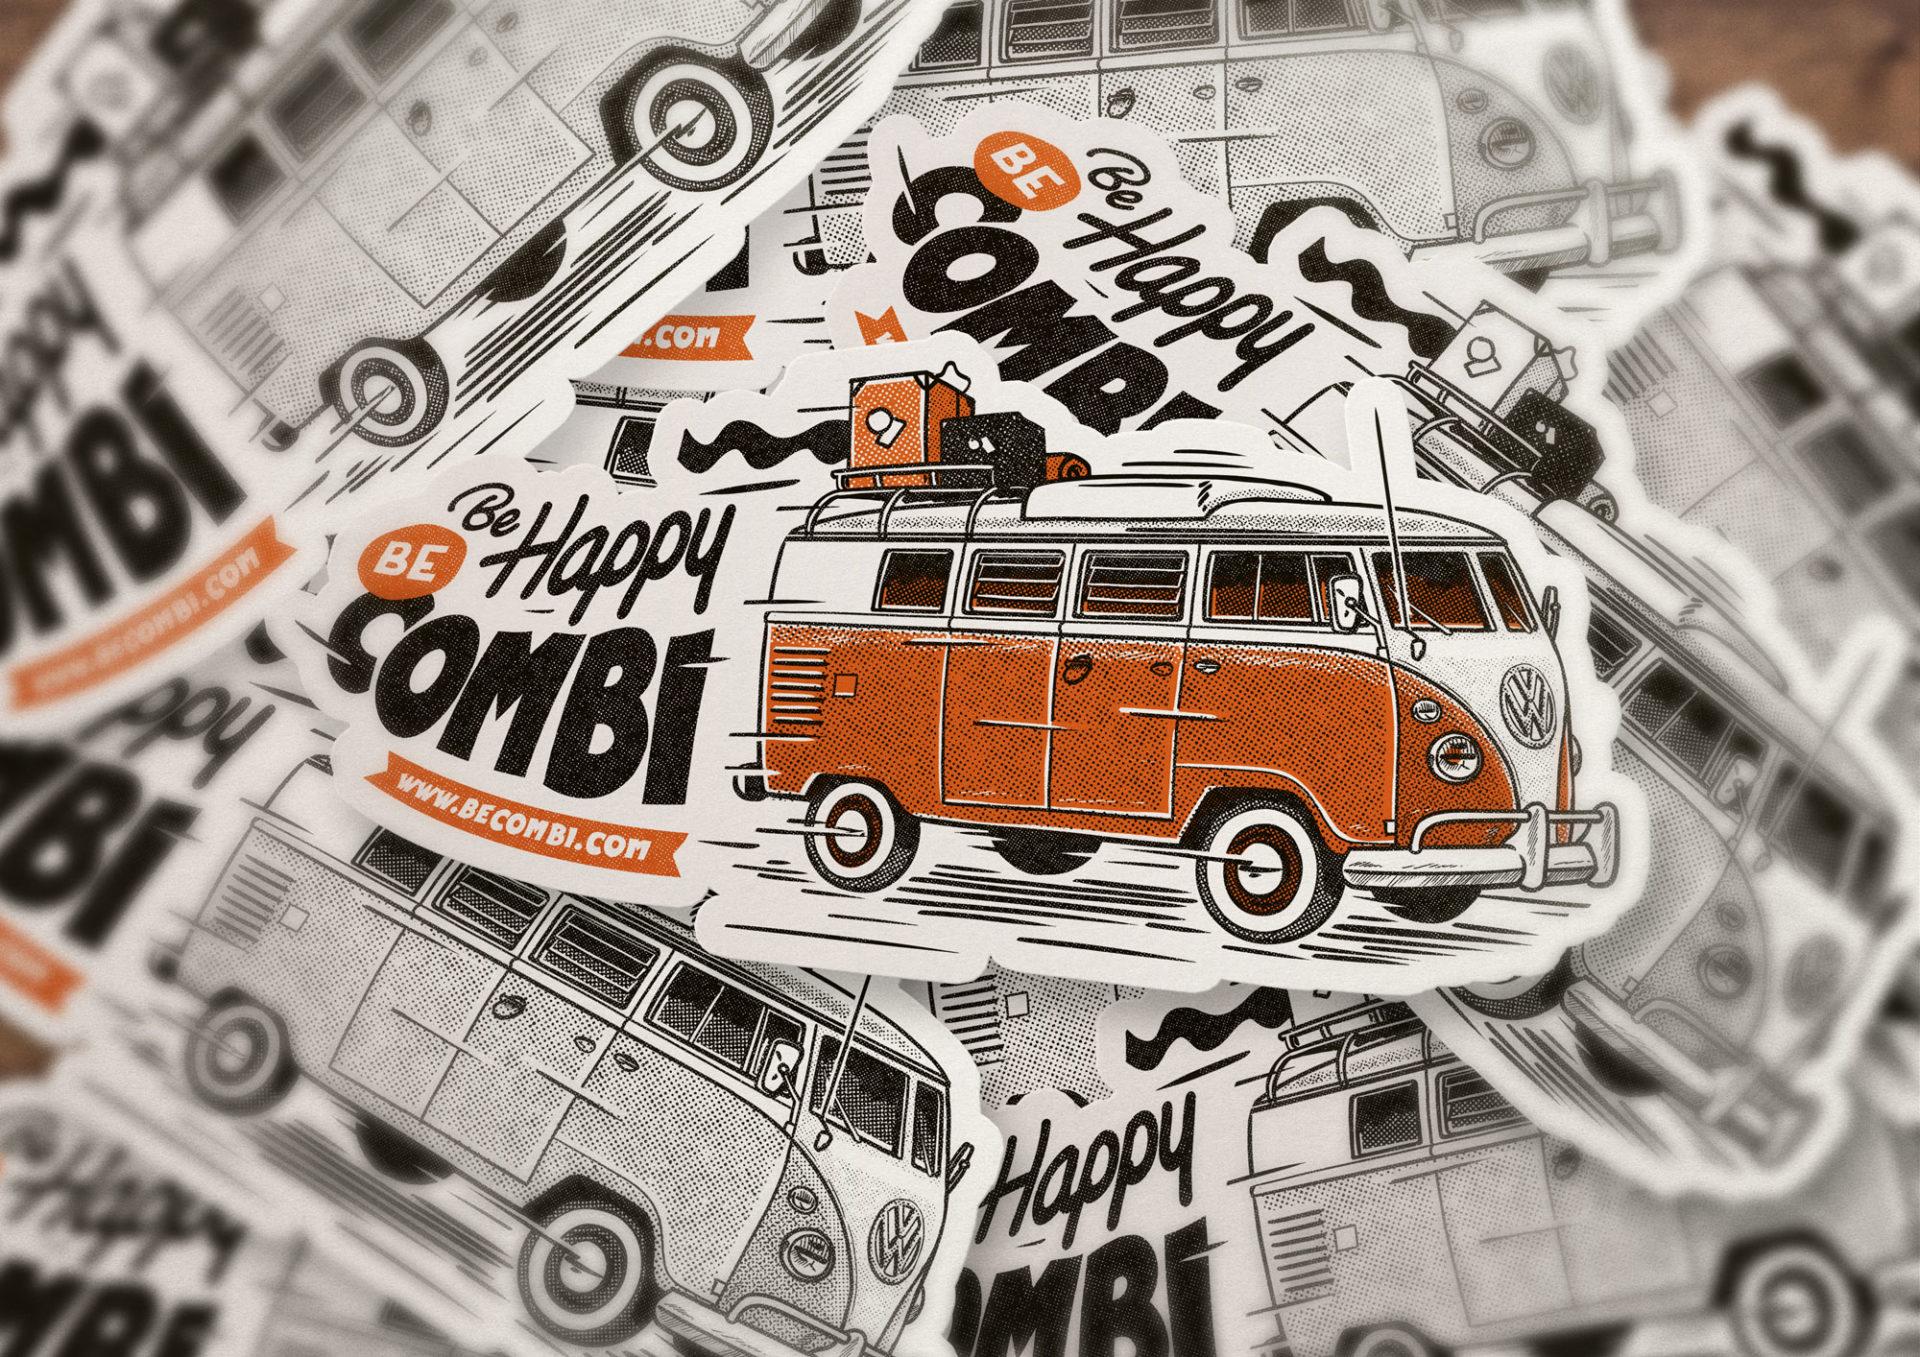 Stickers BeCombi new logo 2020